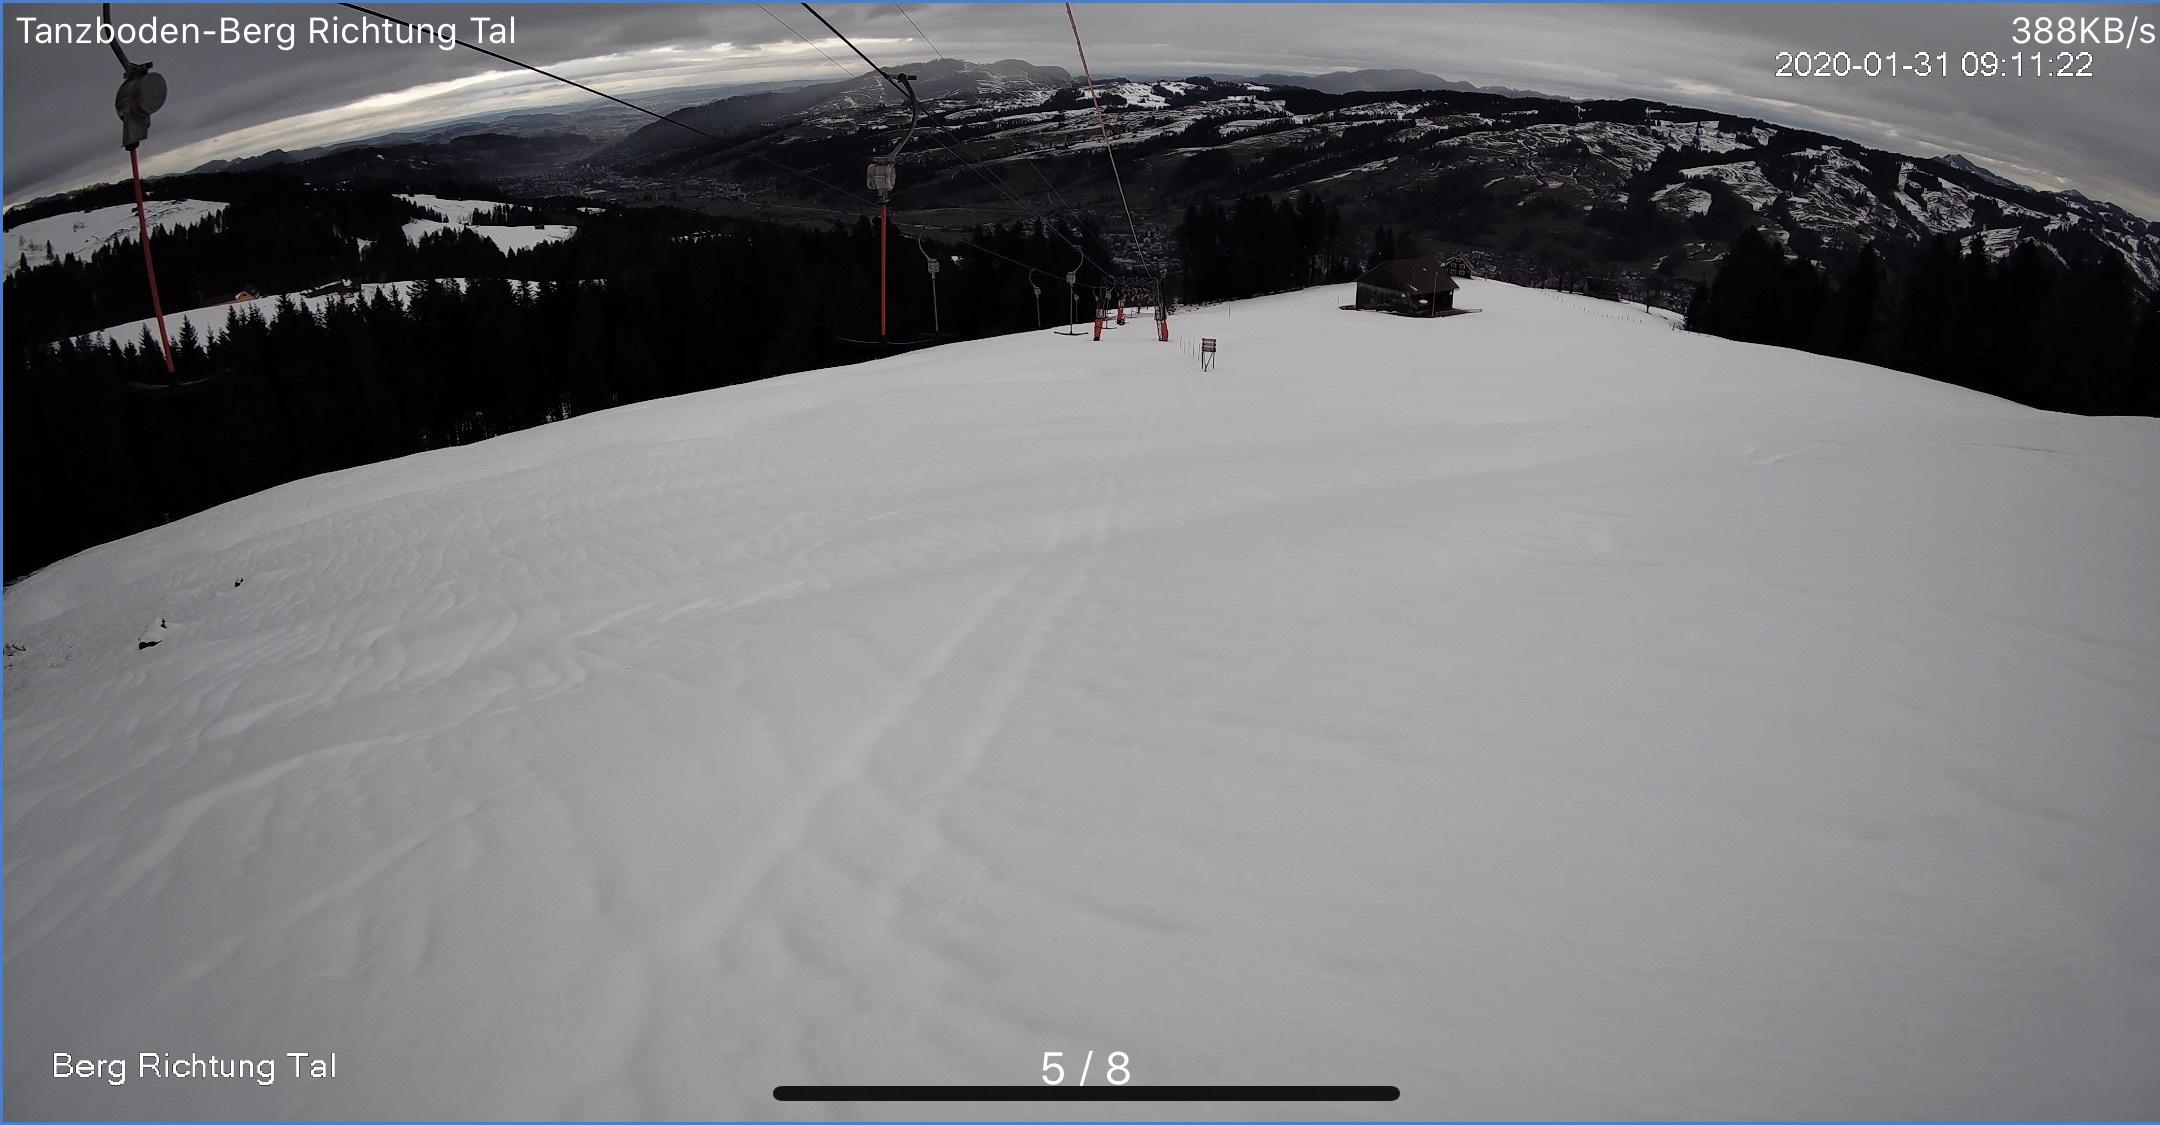 Ebnat-Kappel Skilift Tanzboden